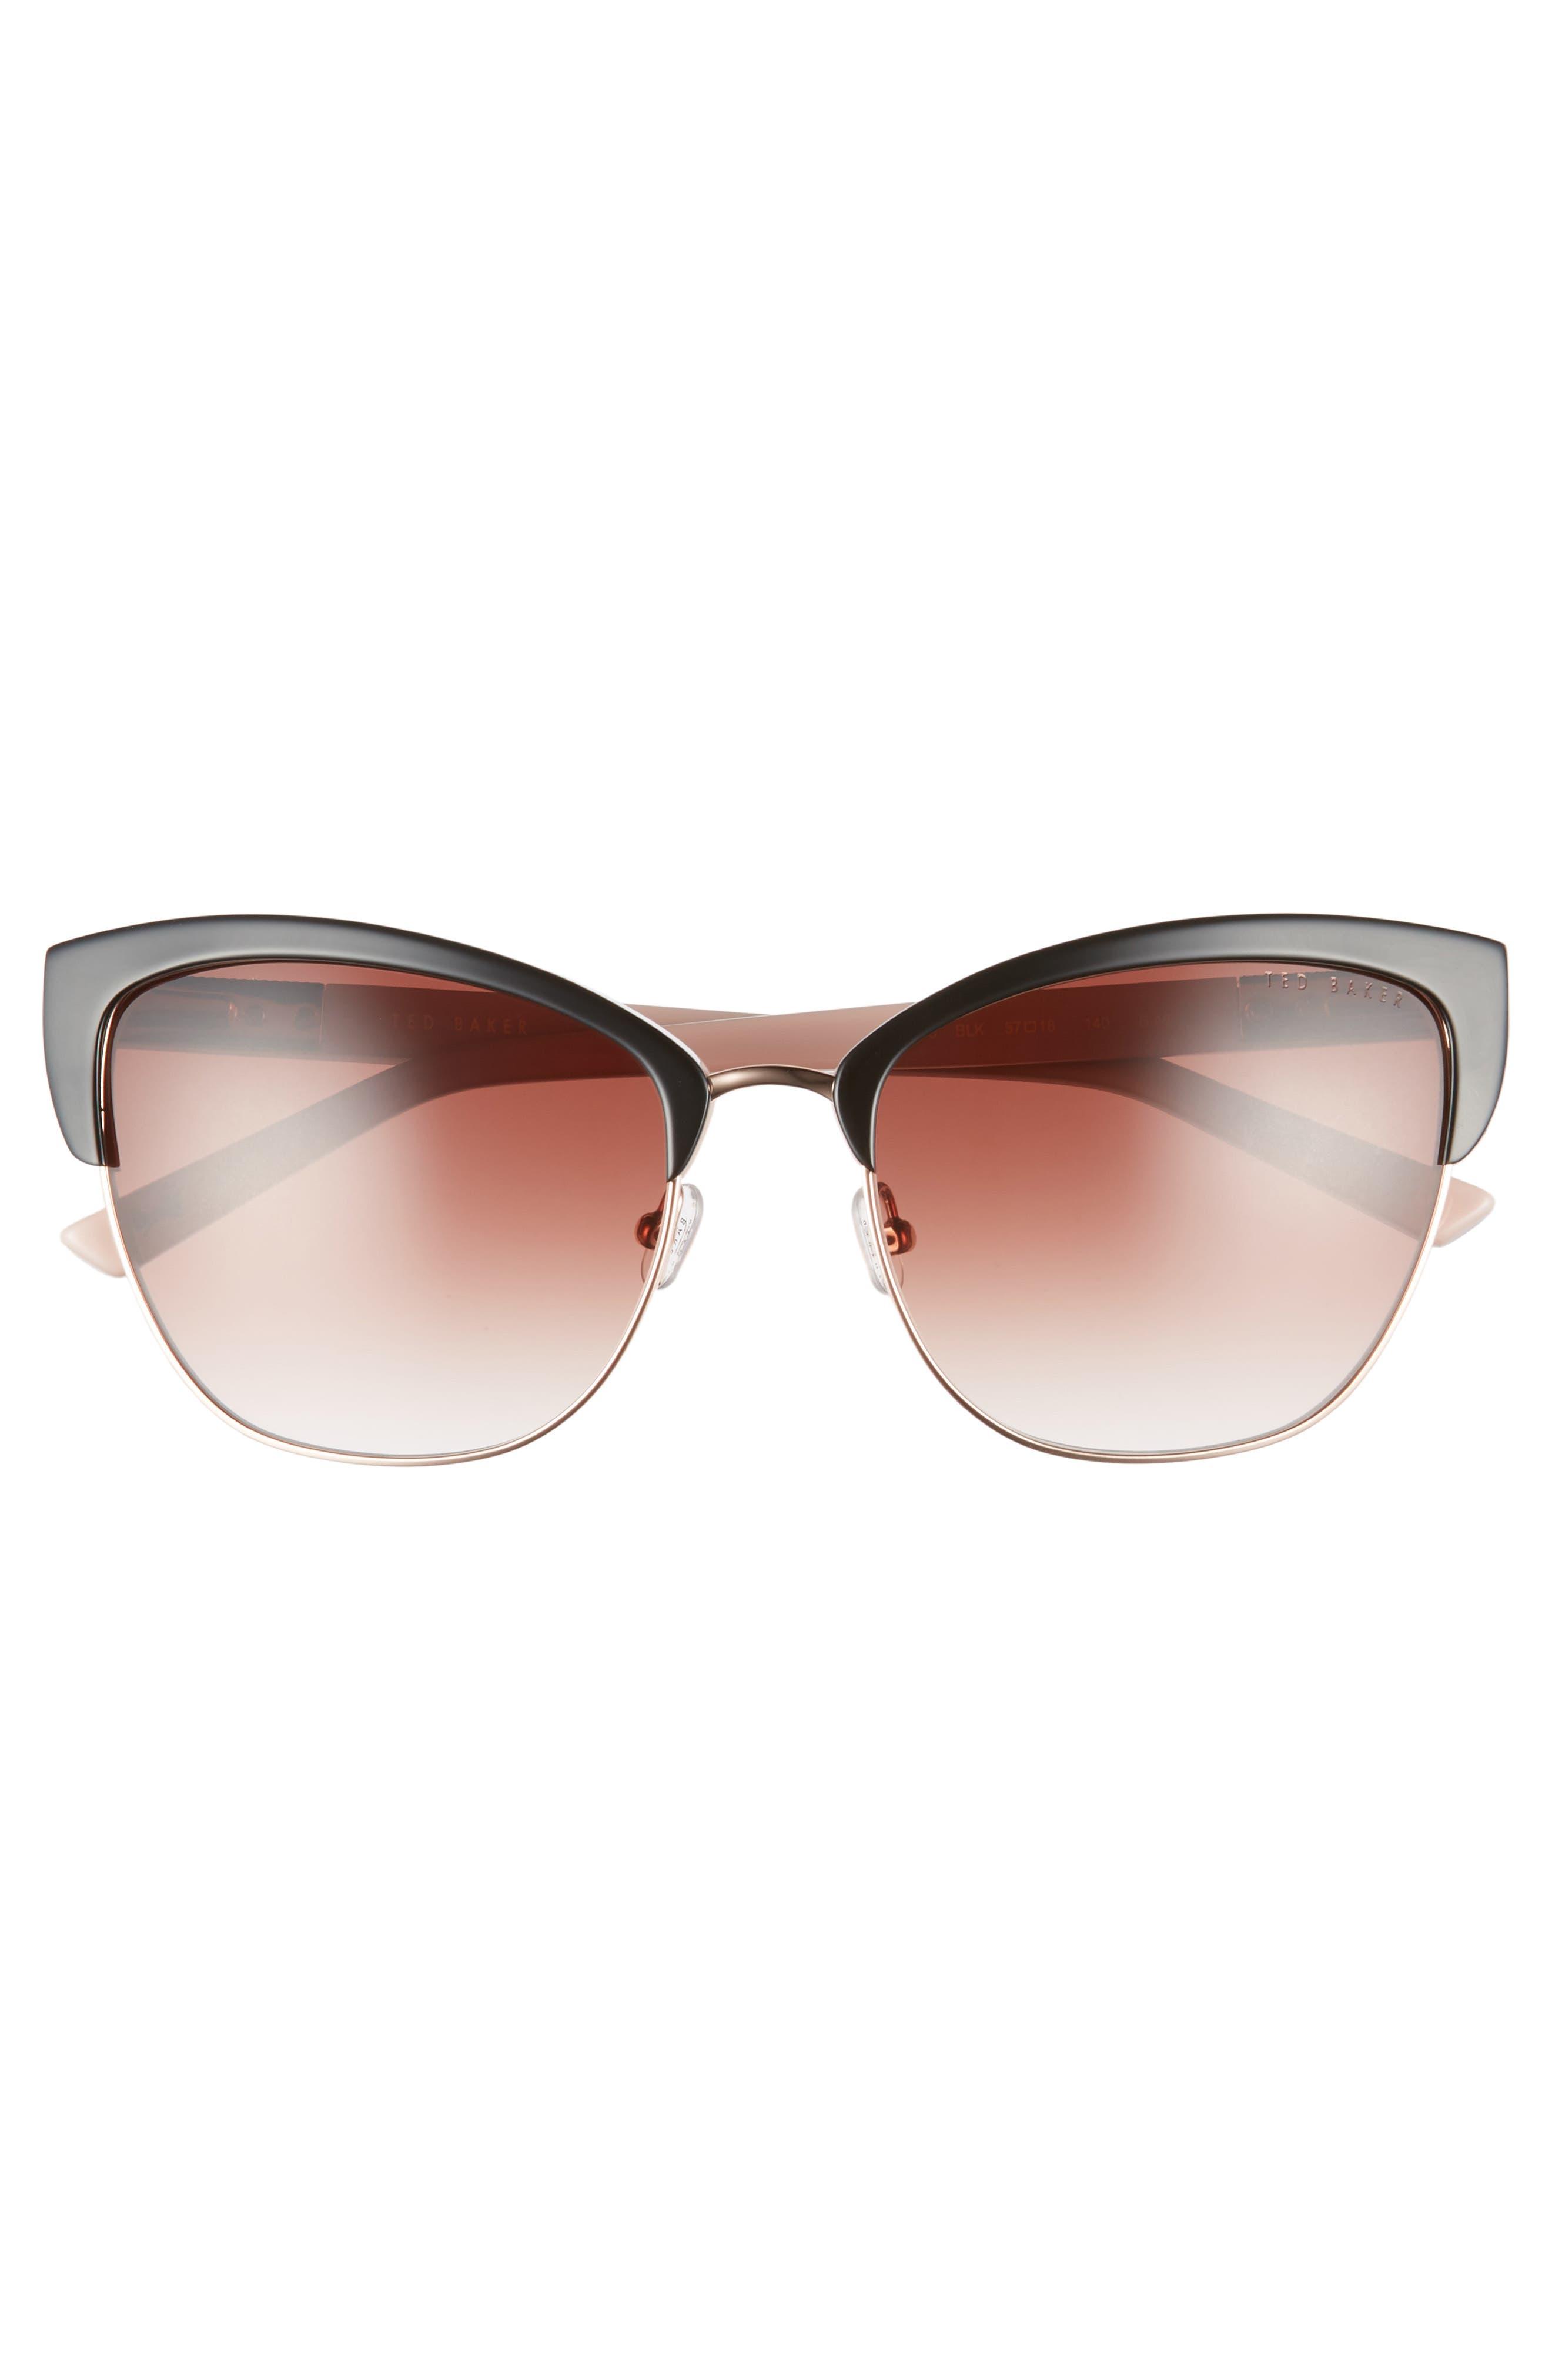 57mm Cat Eye Sunglasses,                             Alternate thumbnail 3, color,                             BLACK